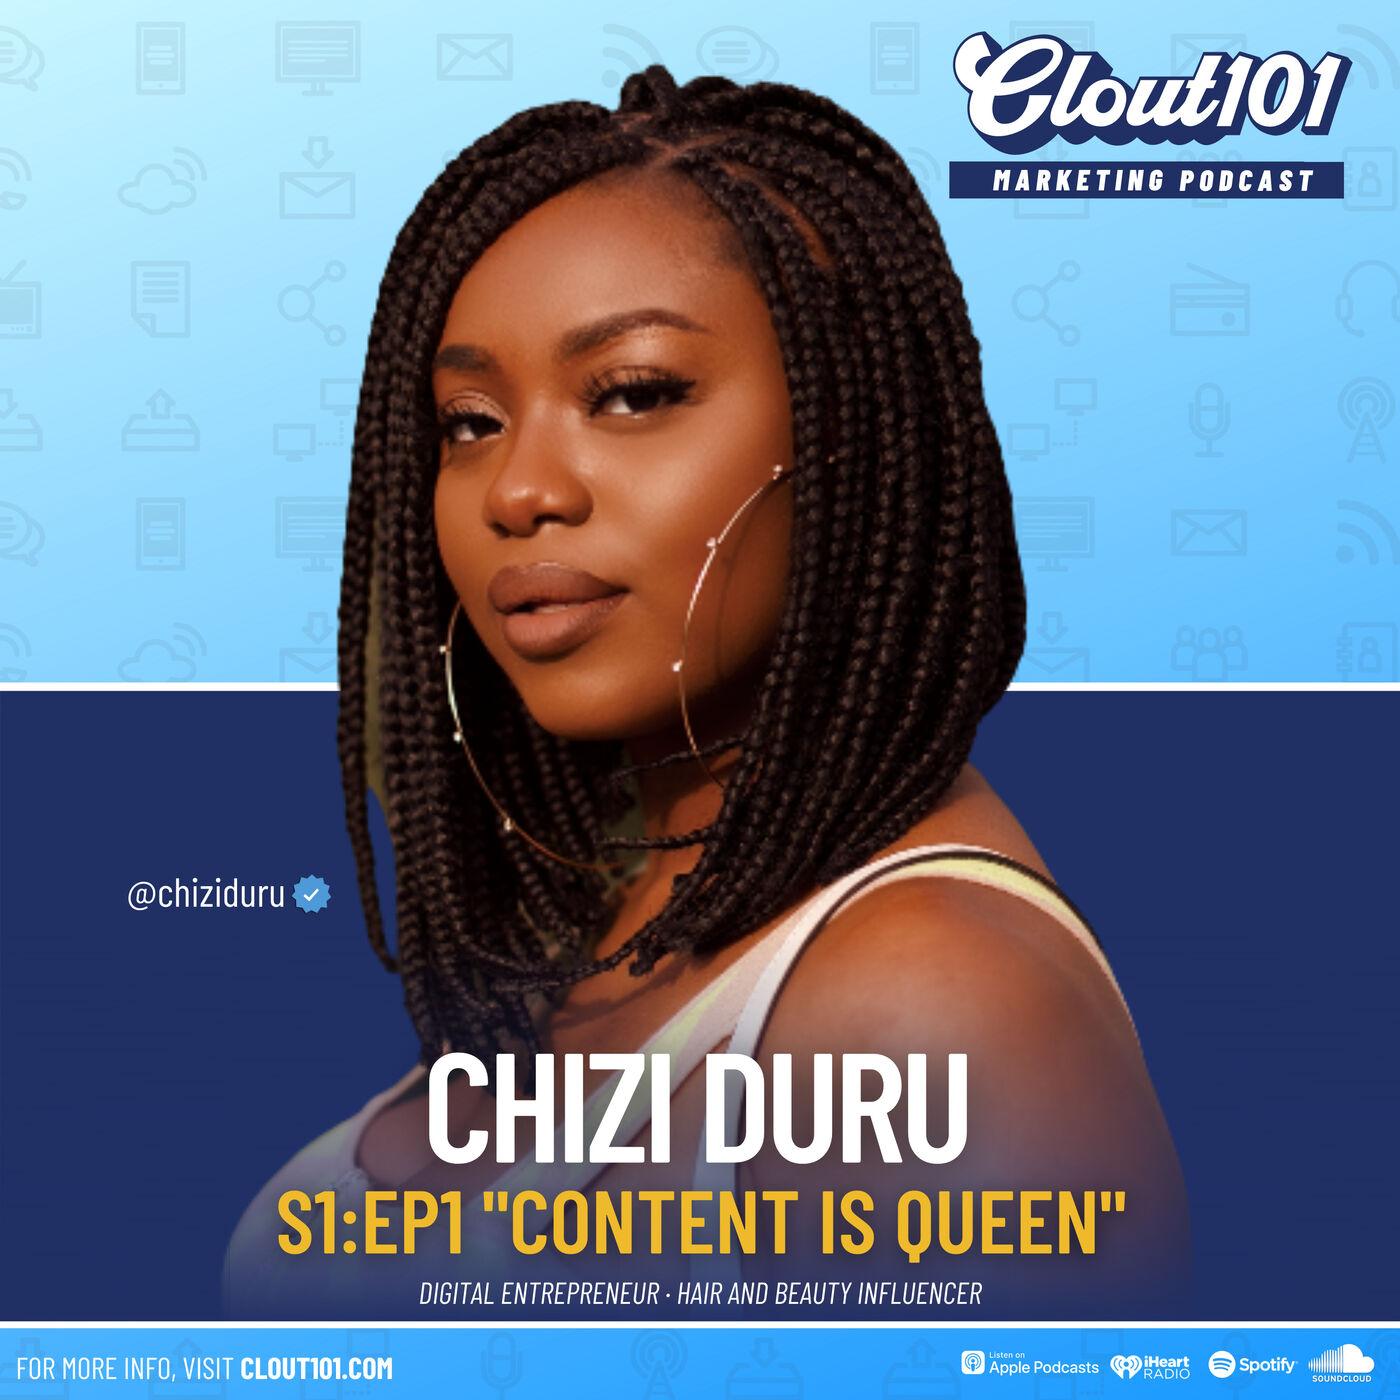 1: Chizi Duru on Brand Partnerships, Leveraging YouTube, and Monetization